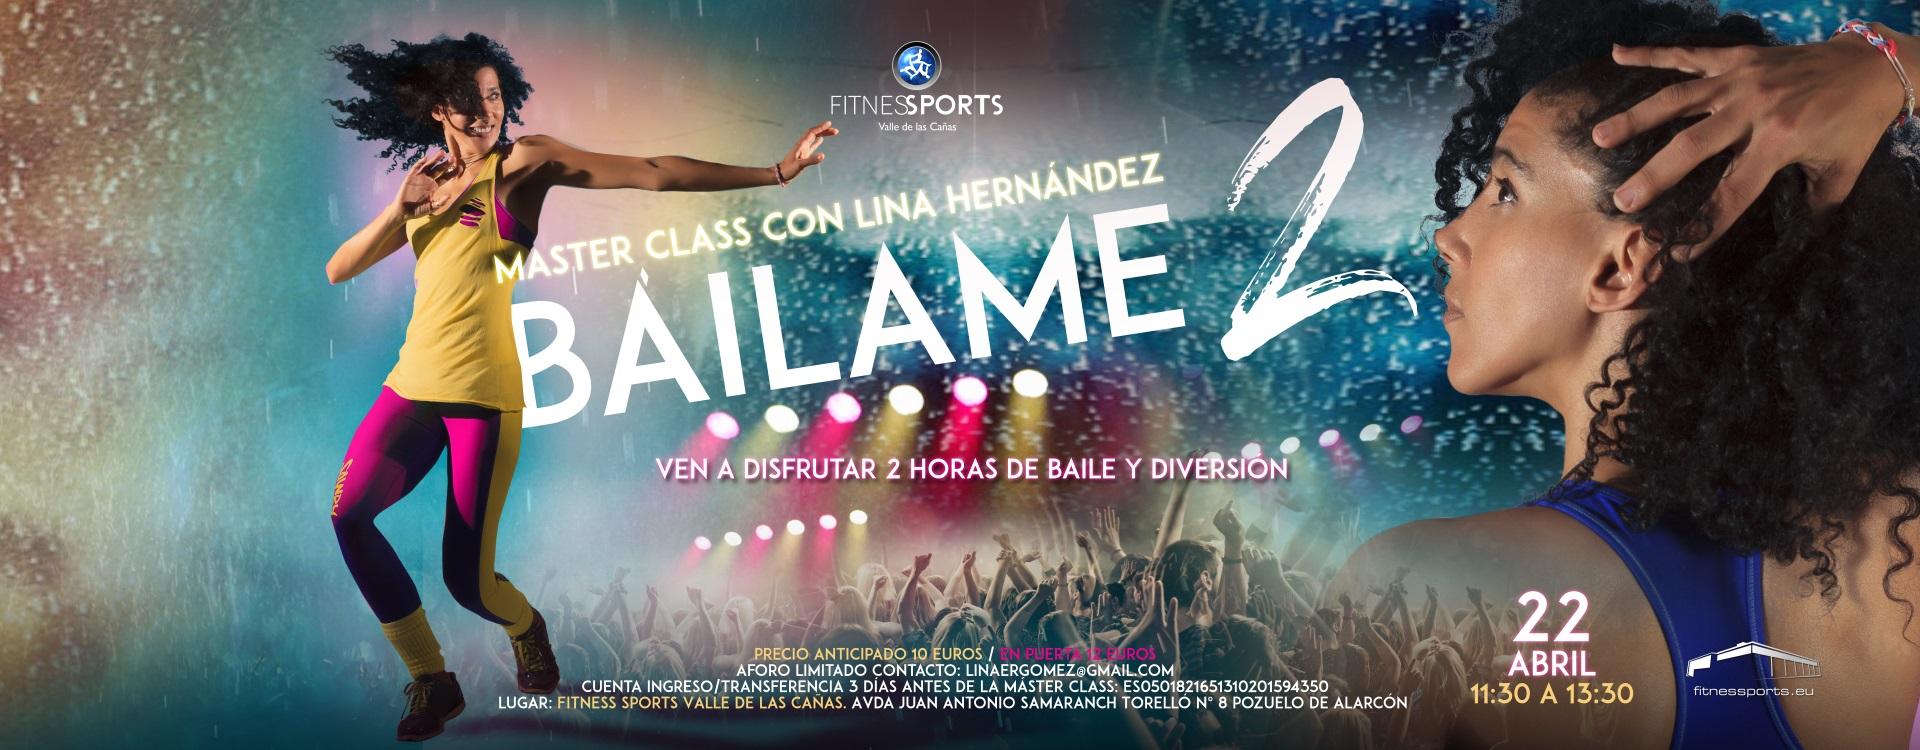 Bailame 2 Lina Hernandez Fitness Sports Perfect Pixel Publicidad